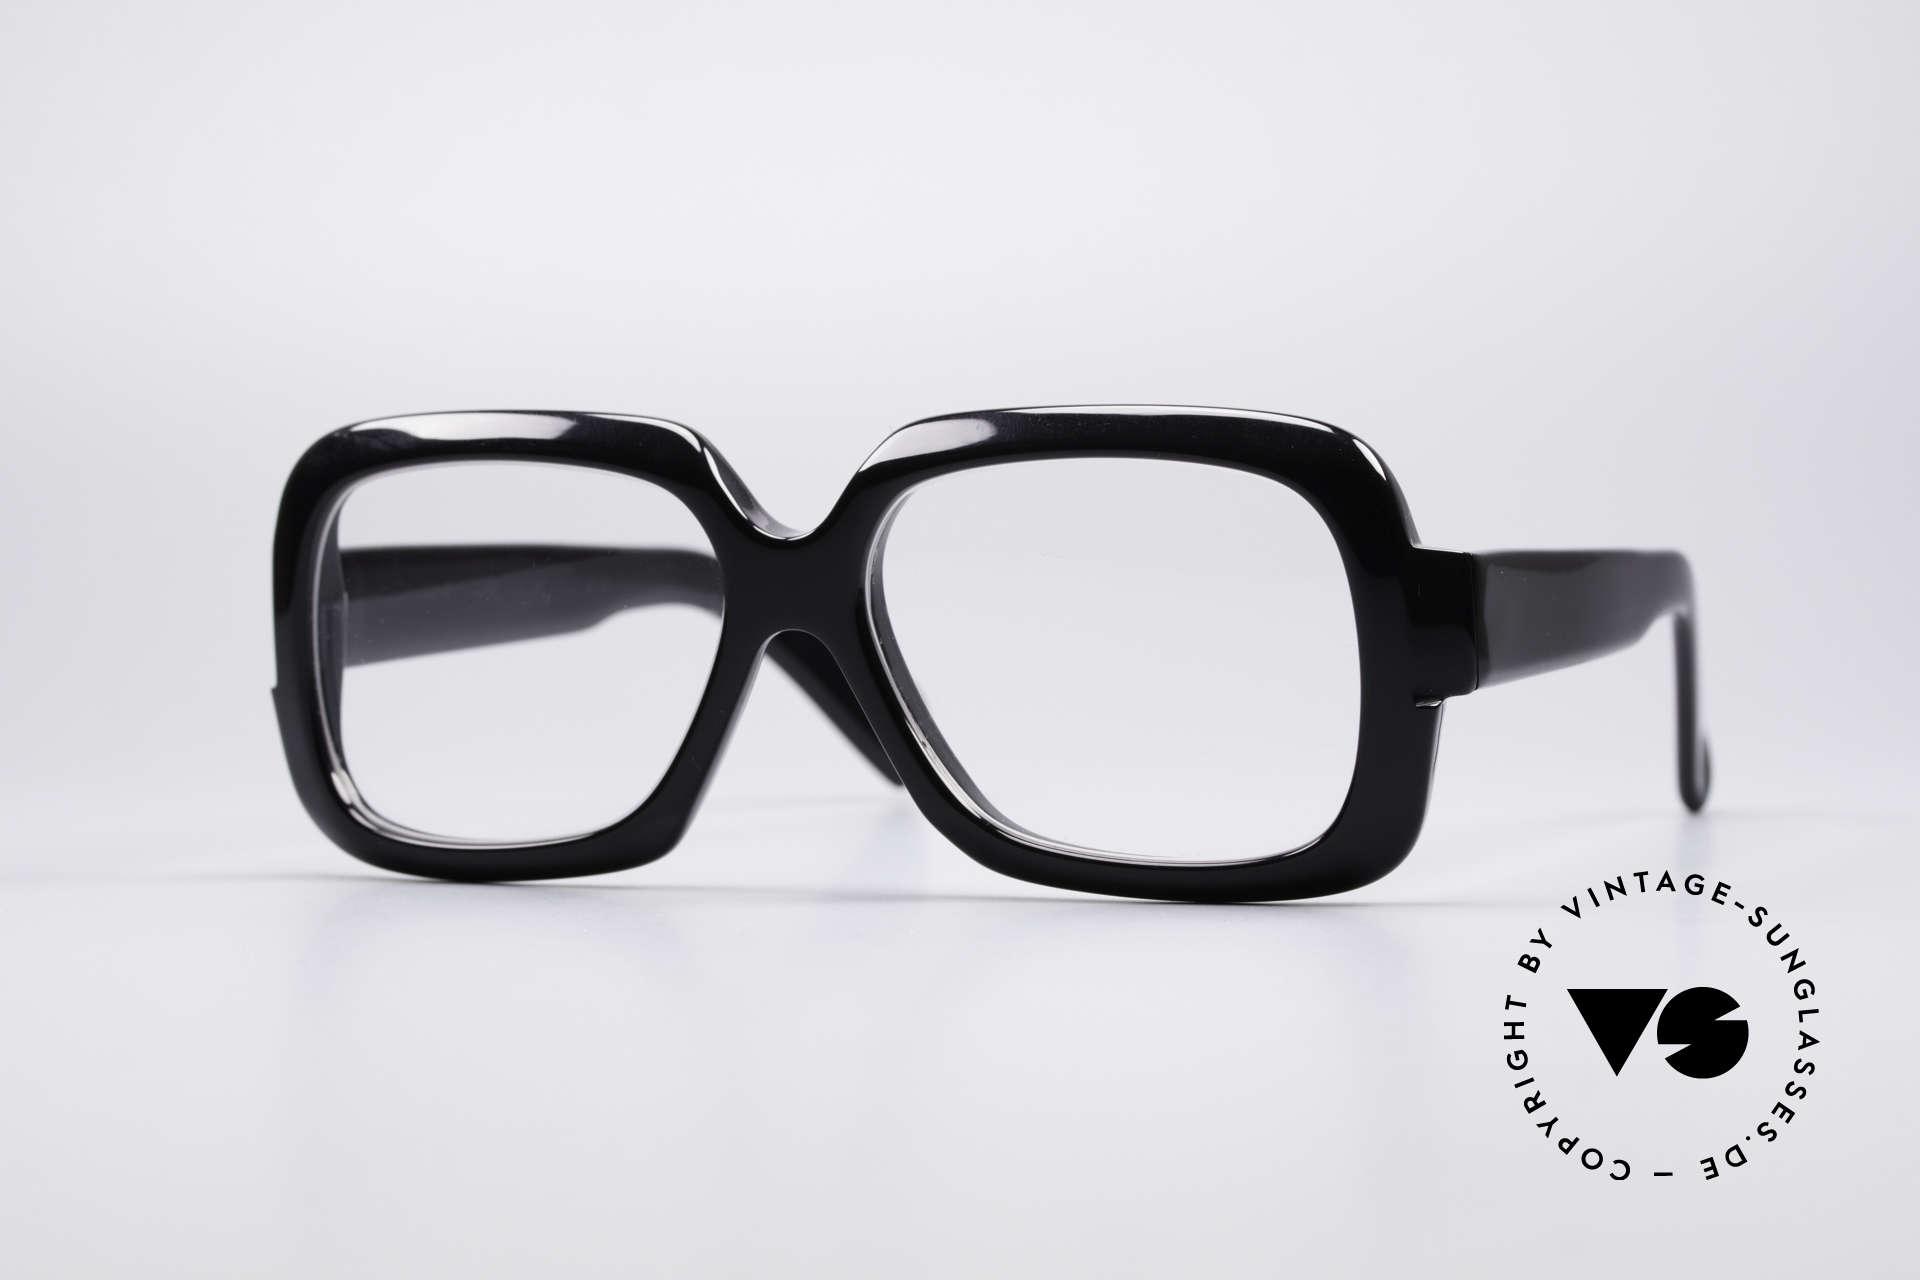 909d4e801b Glasses Silhouette 227 70 s Old School Glasses